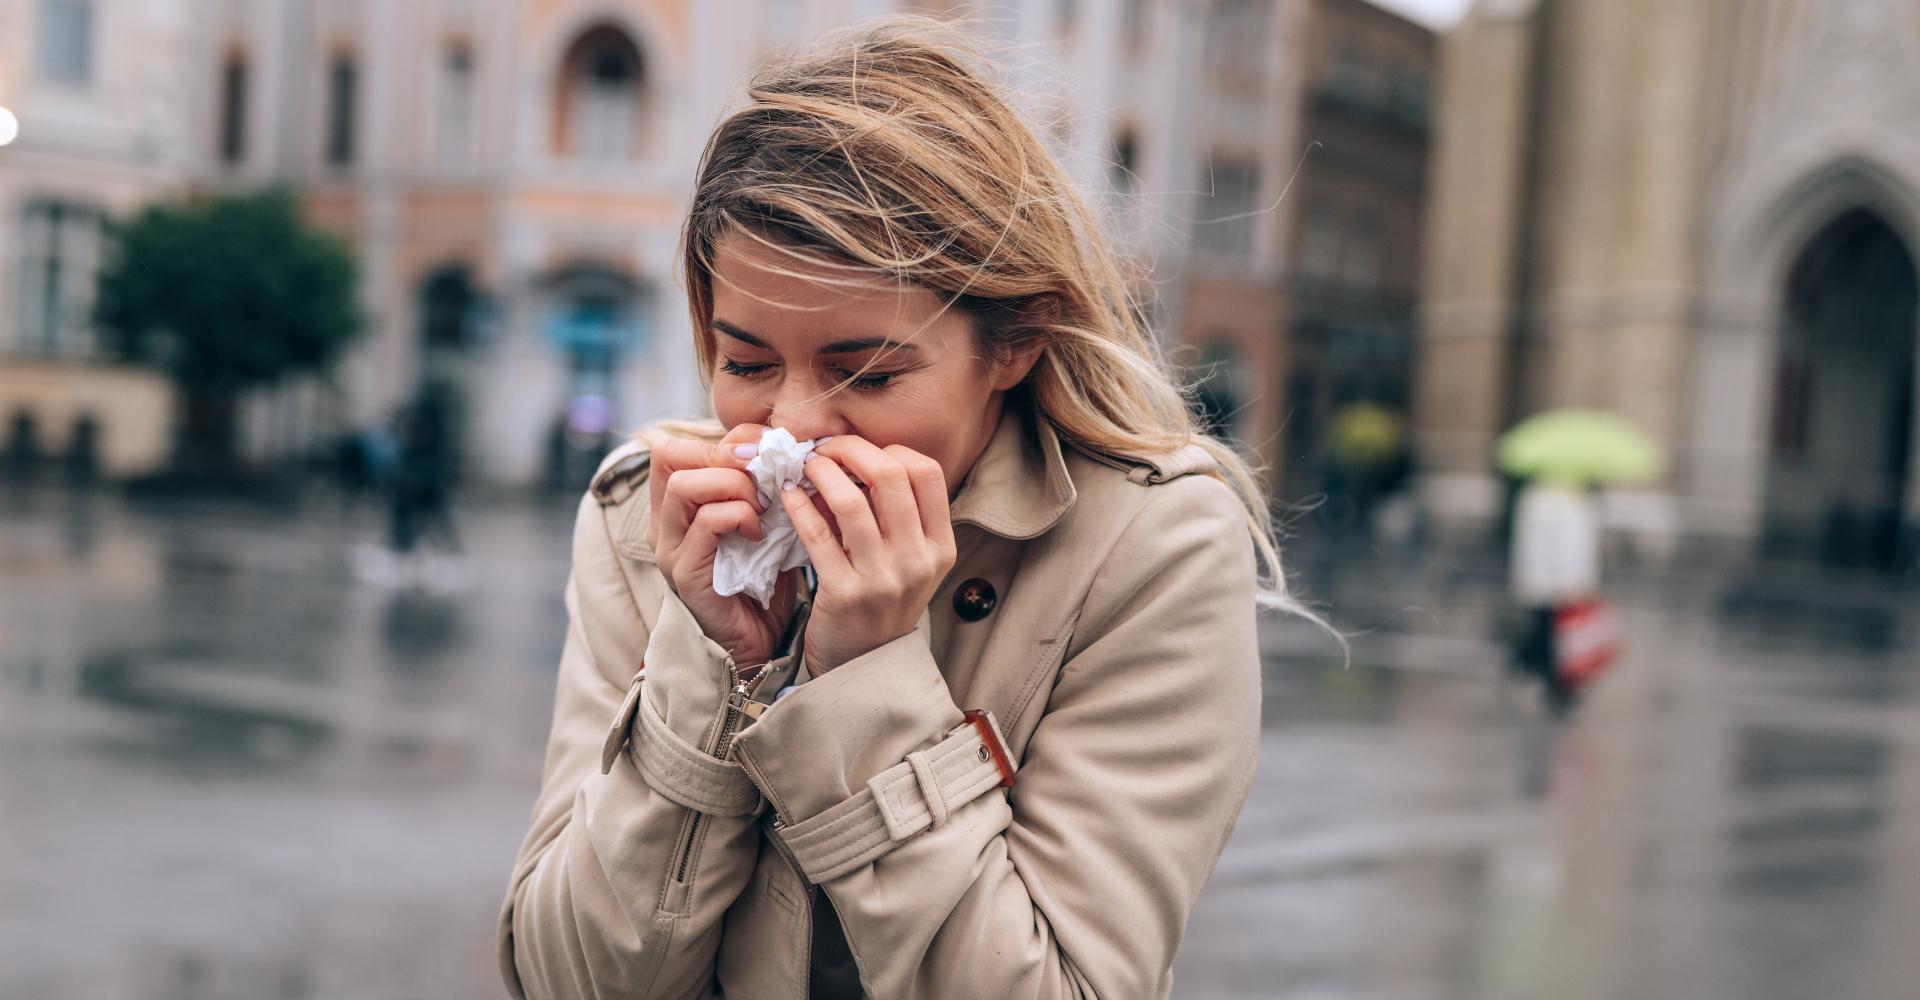 Противовирусные препараты и простуда